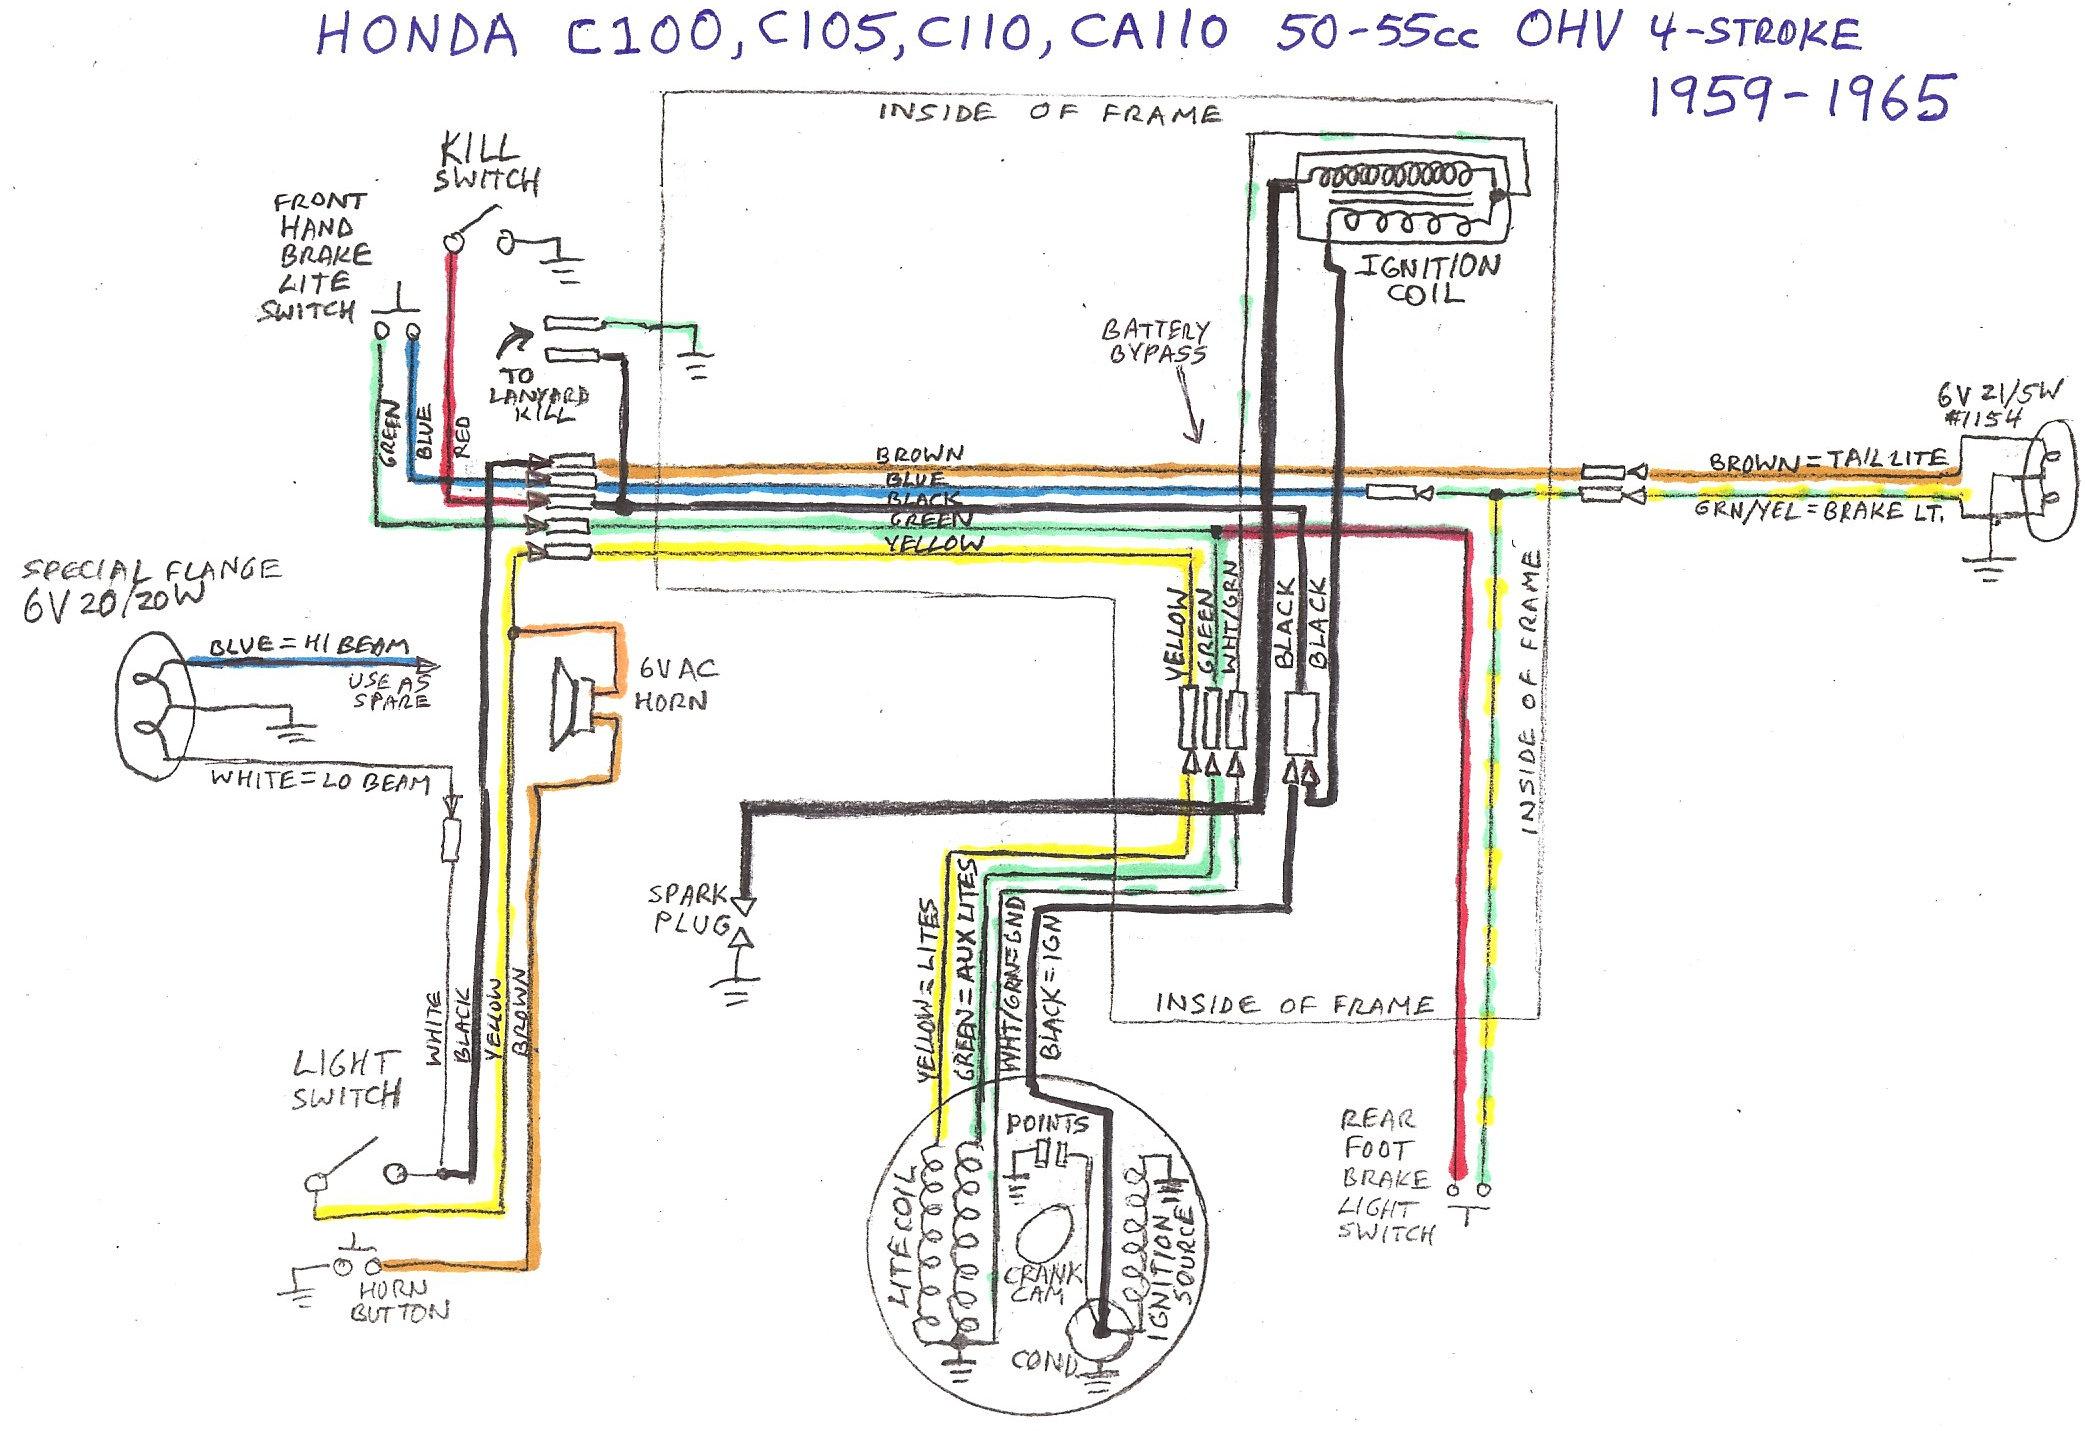 Honda Hobbit Wiring Diagram - Box Wiring Diagram •